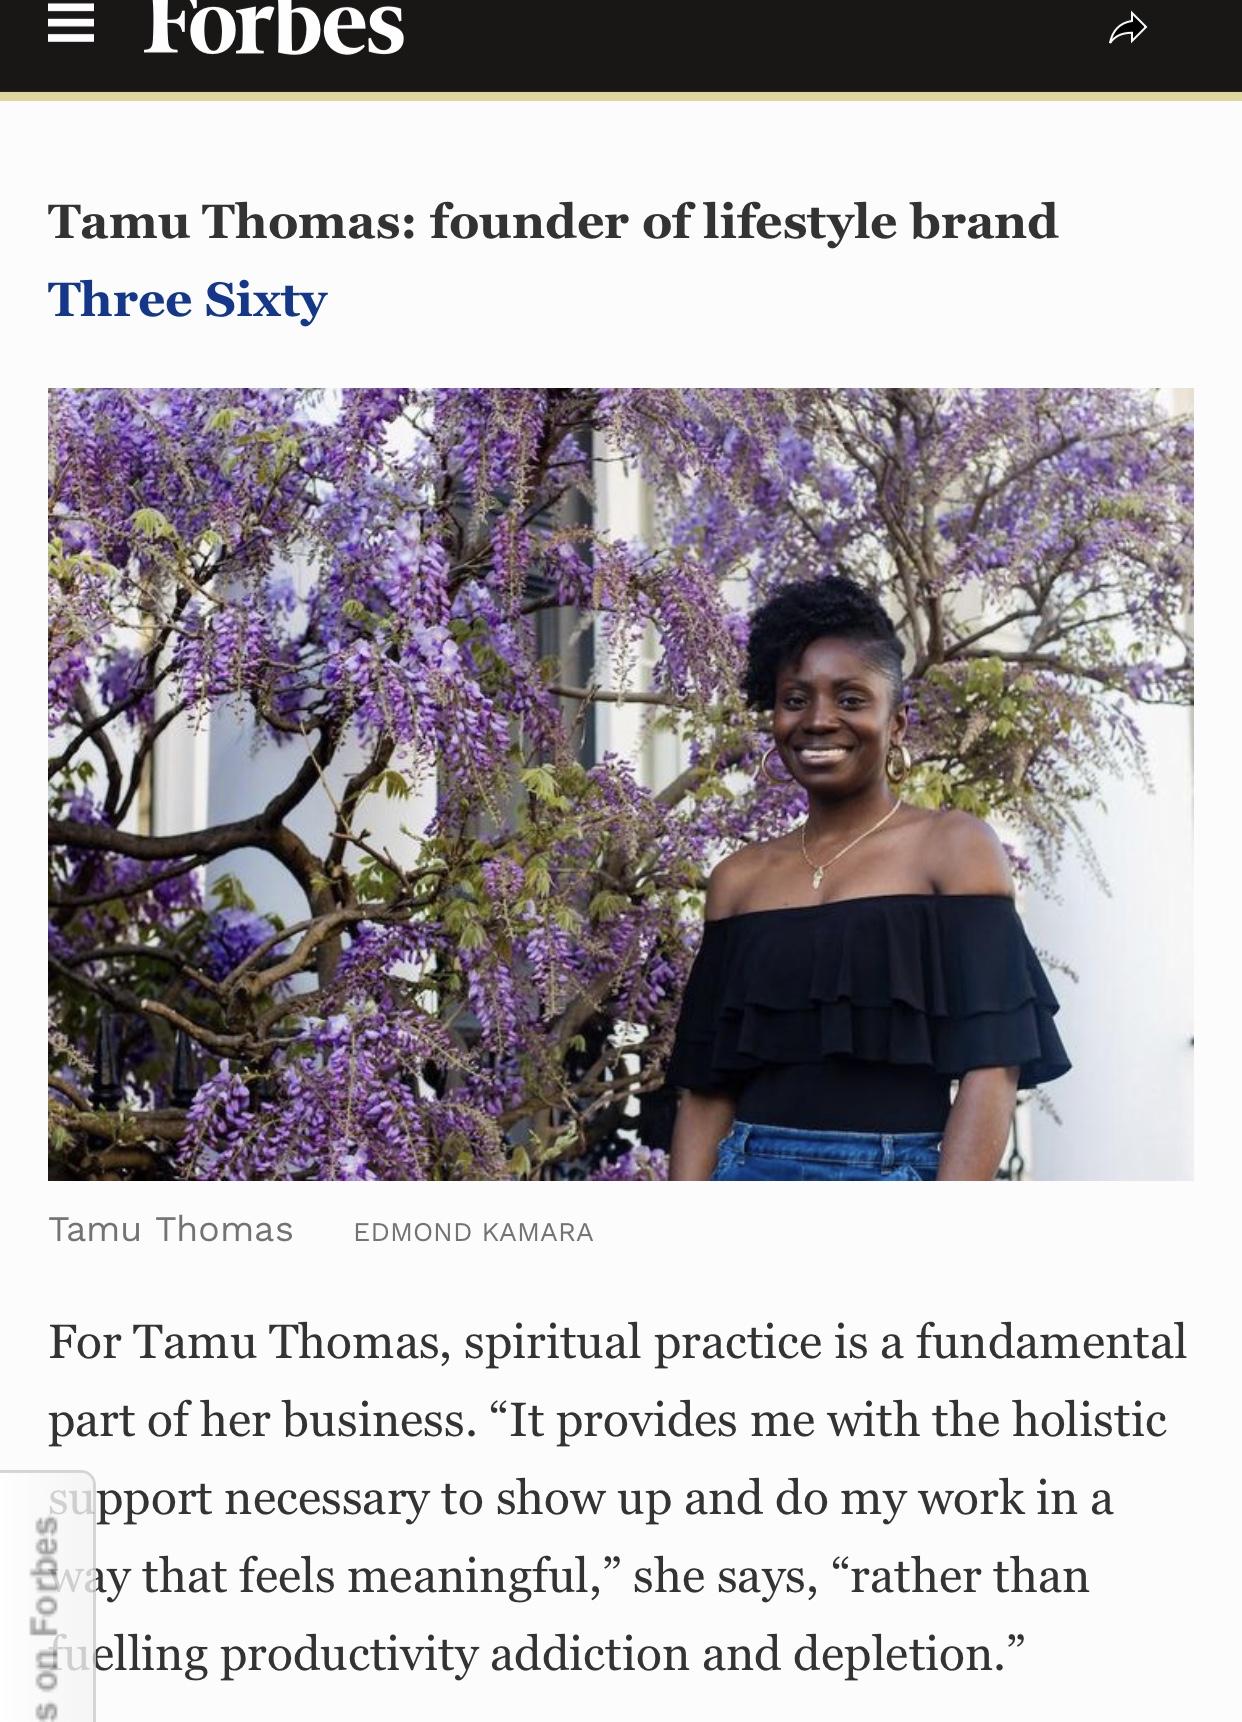 Forbes magazine, Forbes list, Sarah Akwisombe, spirituality and business, Deepak Chopra, tamu thomas, live three sixty, everyday joy